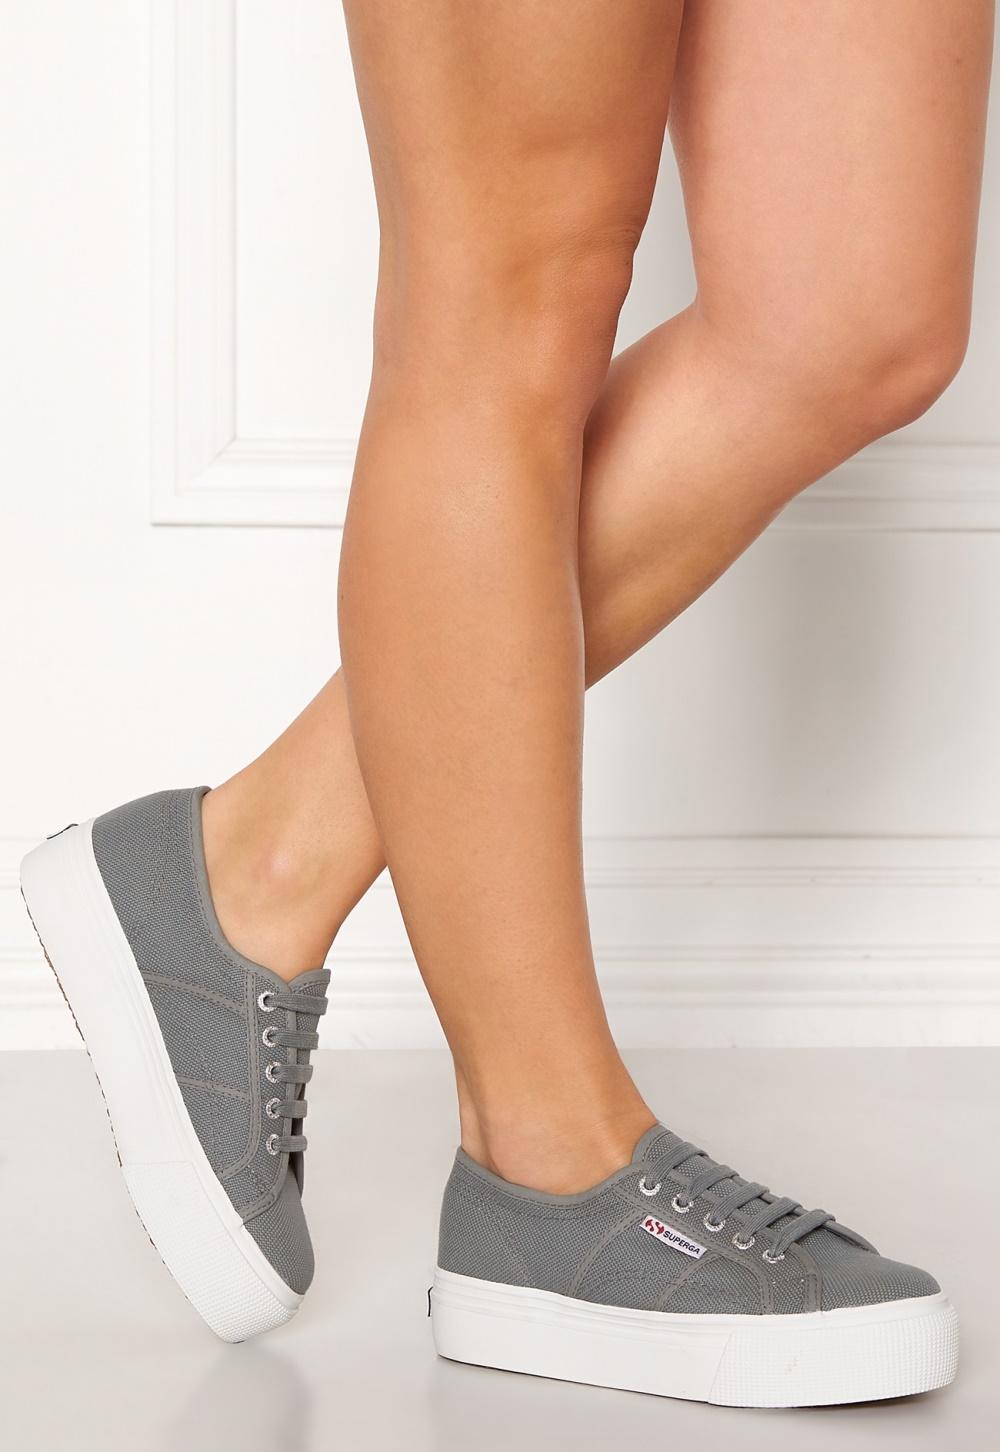 Superga Acotw Linea Sneakers Grey DK